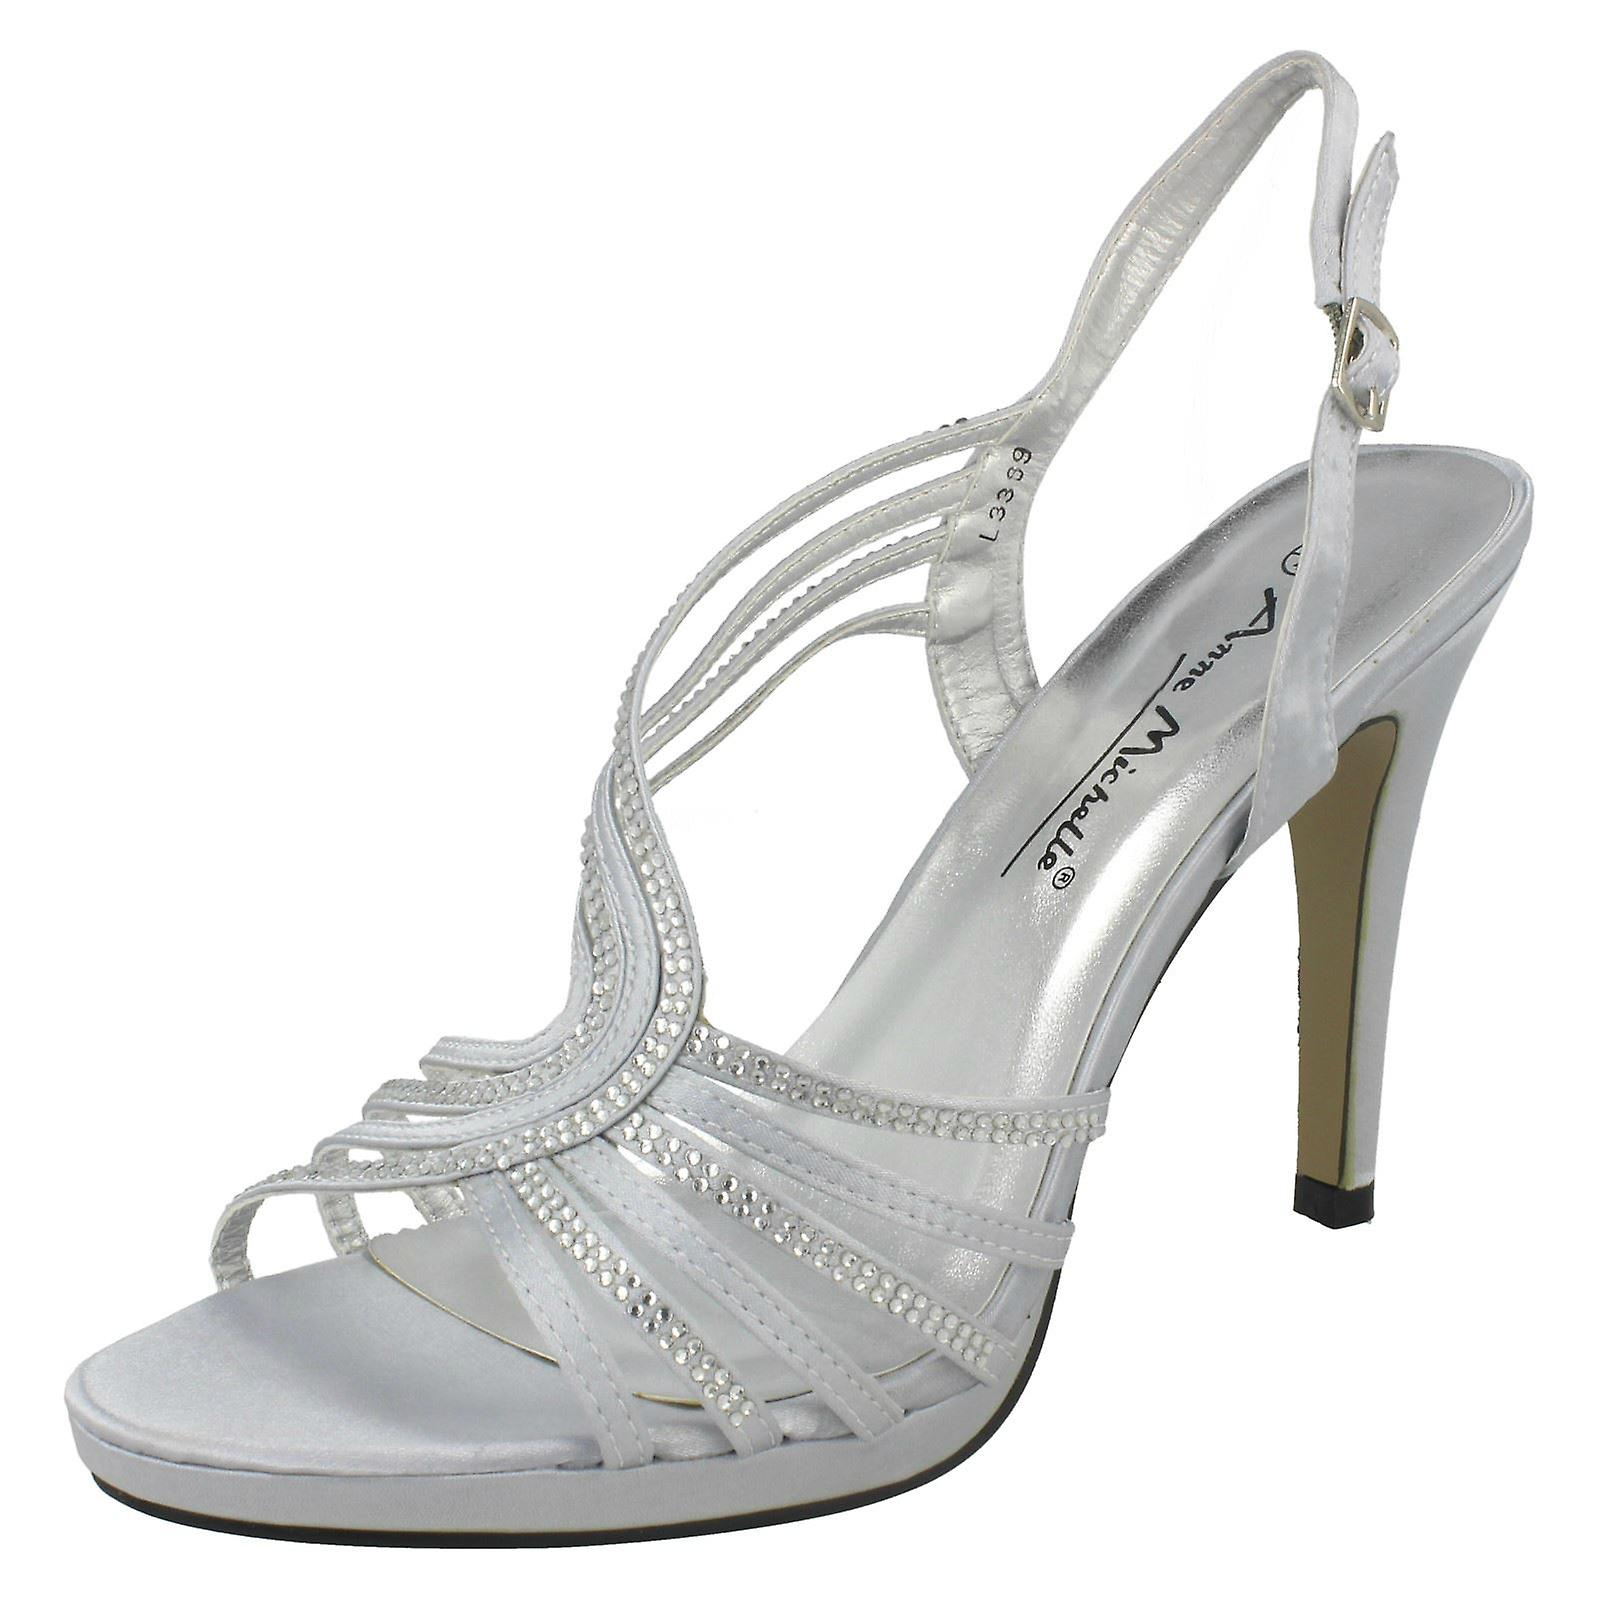 Ladies Sling Back Sandal with Diamante Trim